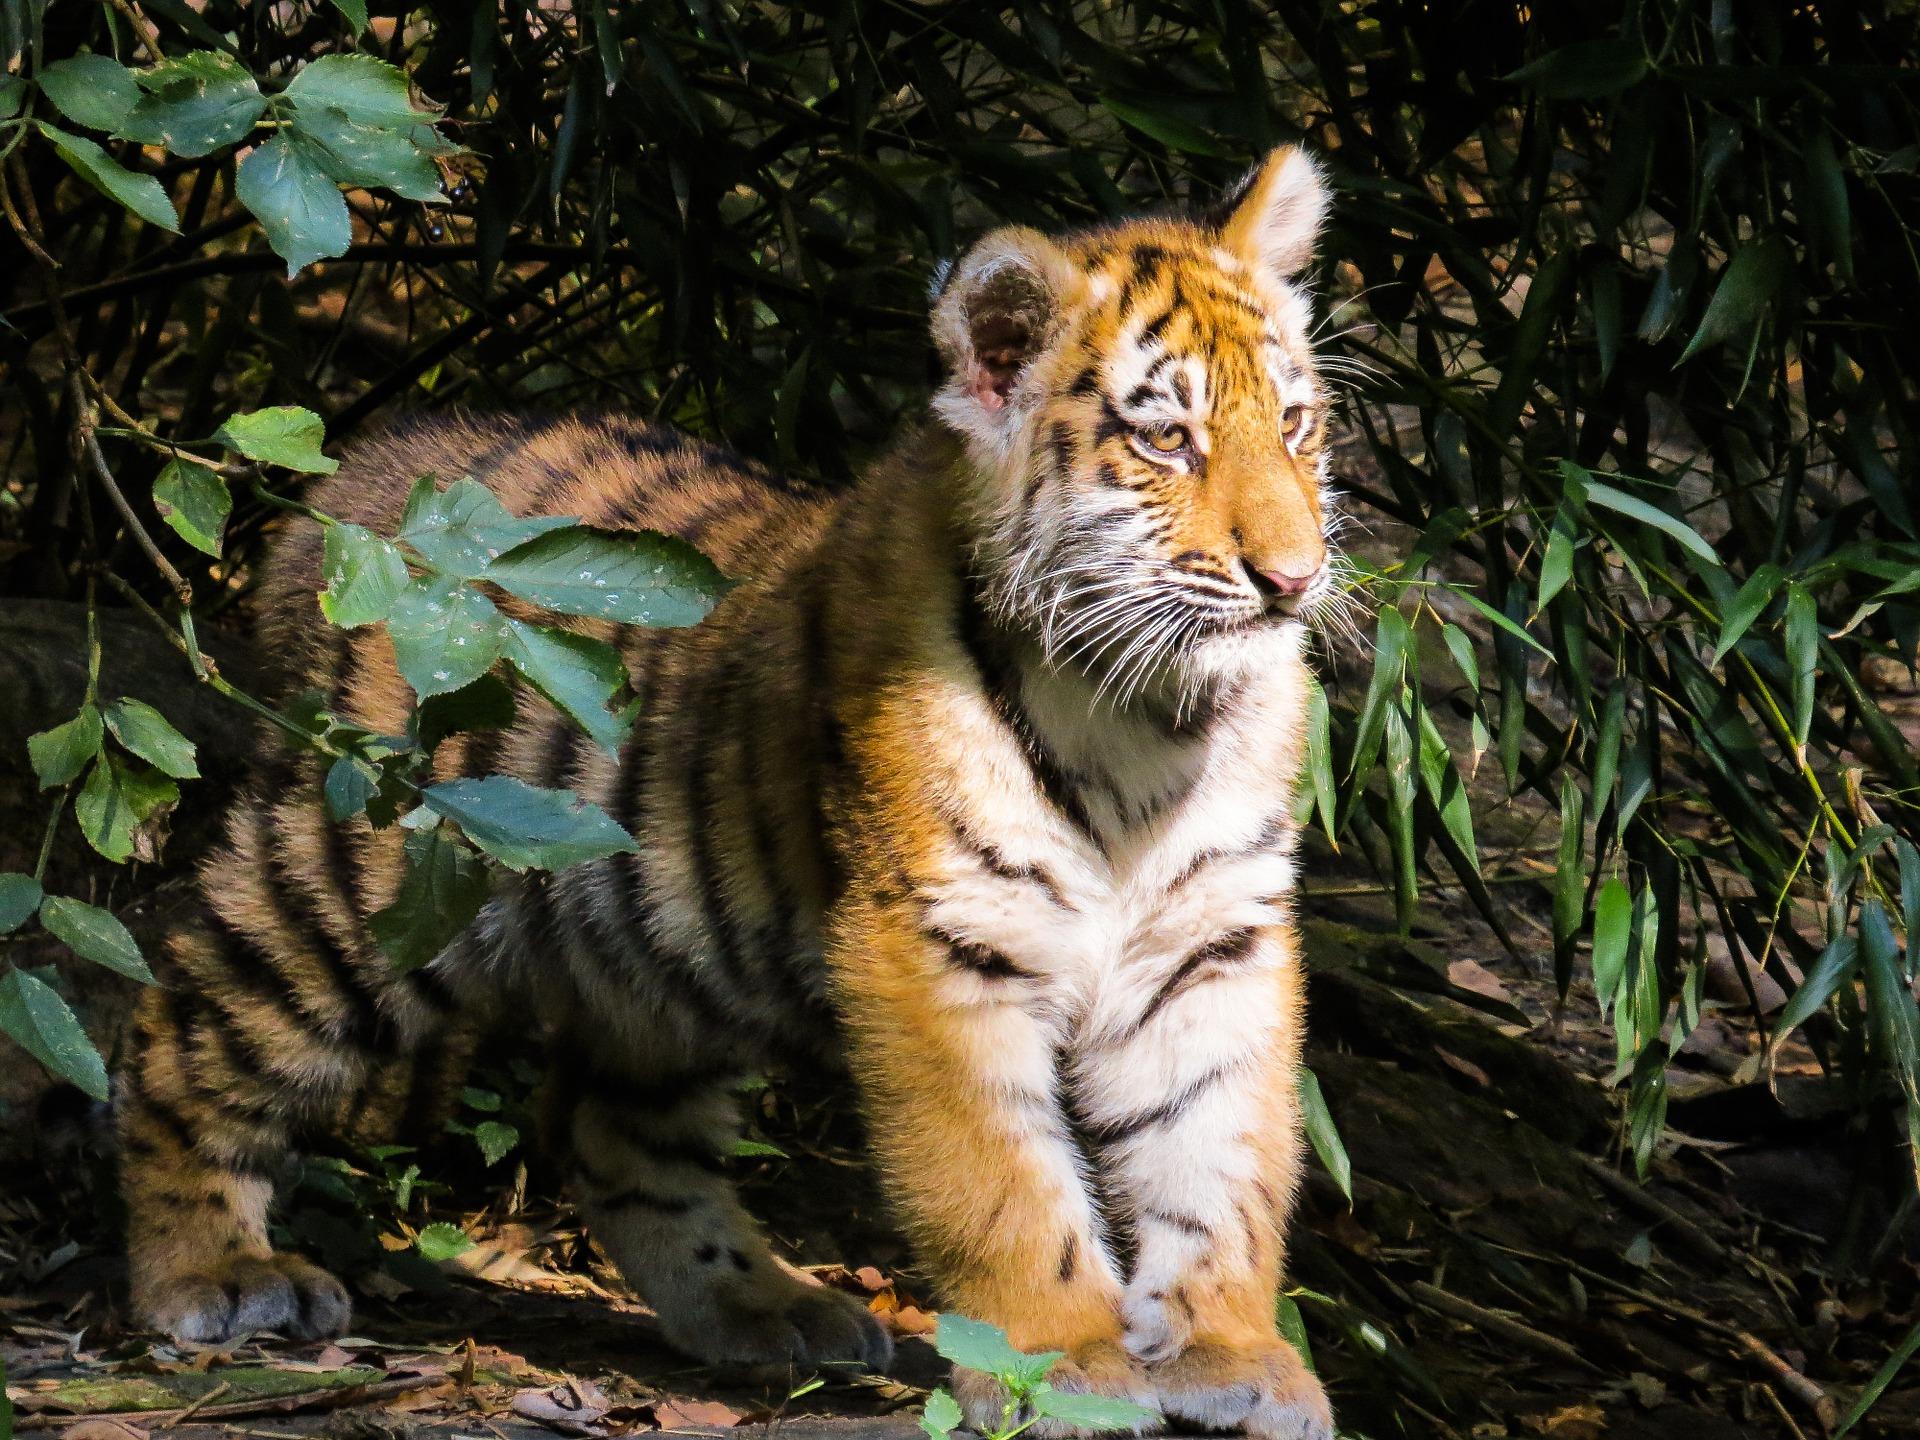 Bengal Tiger, Animal, Bengal, Cub, Jungle, HQ Photo